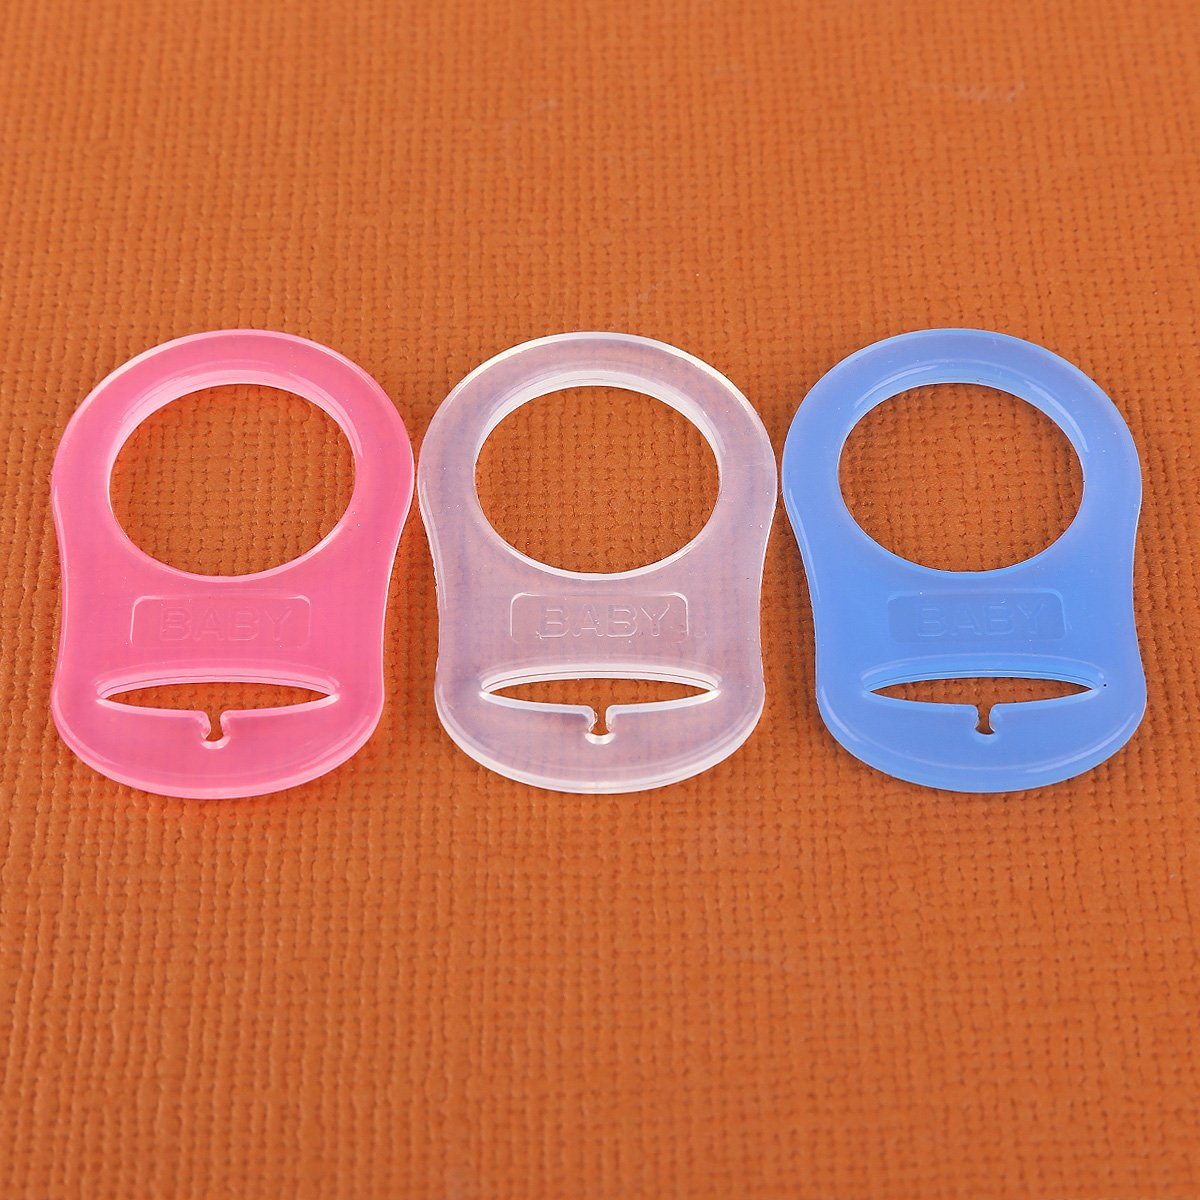 30pcs Clip de silicona Baby Bab?MAM RINGS DUMMY CLIPS Color Transparente Azul Rosa